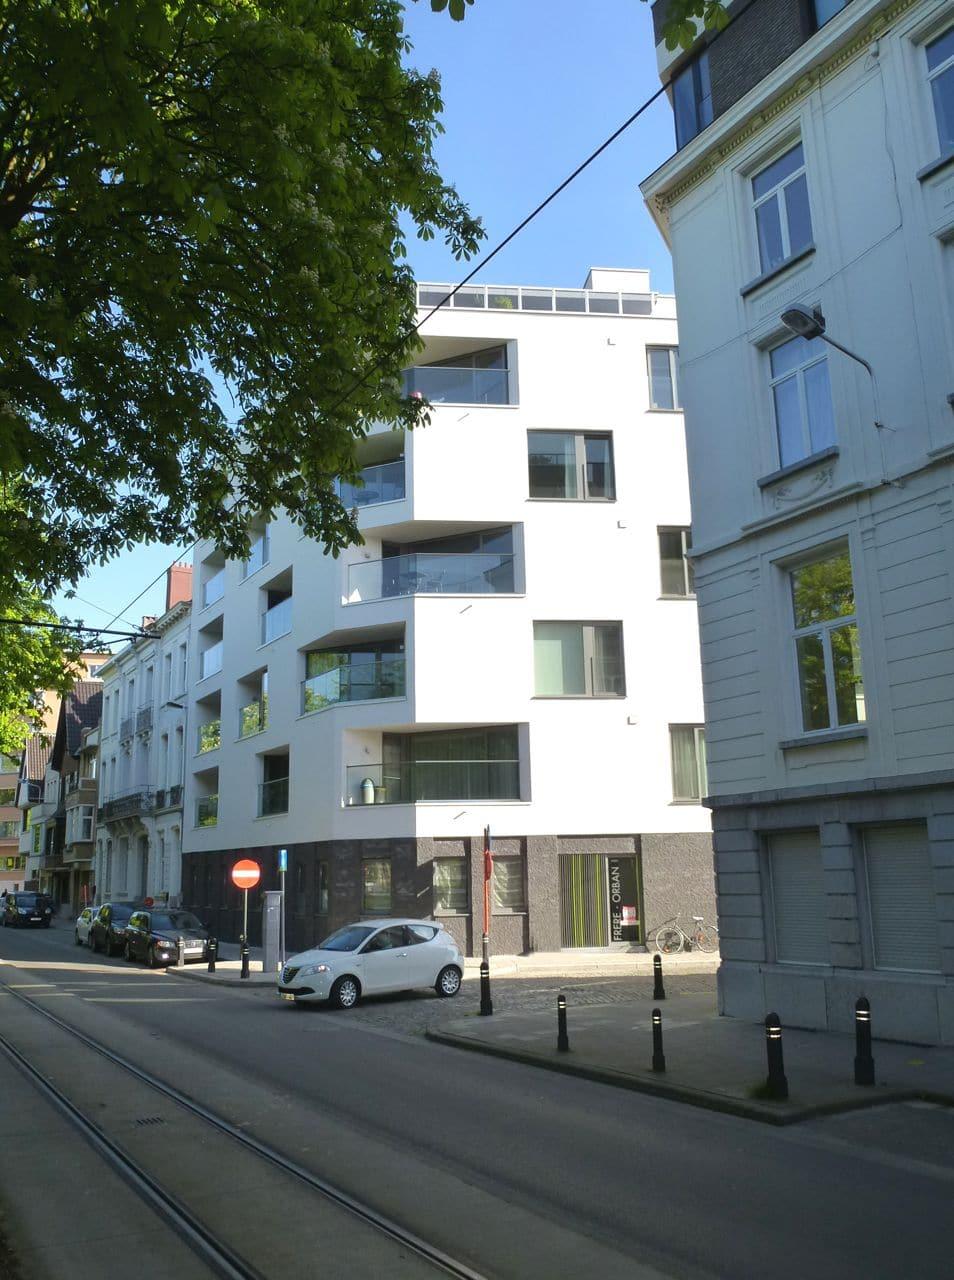 P1120413 | Baeyens & Beck architecten Gent | architect nieuwbouw renovatie interieur | high end | architectenbureau